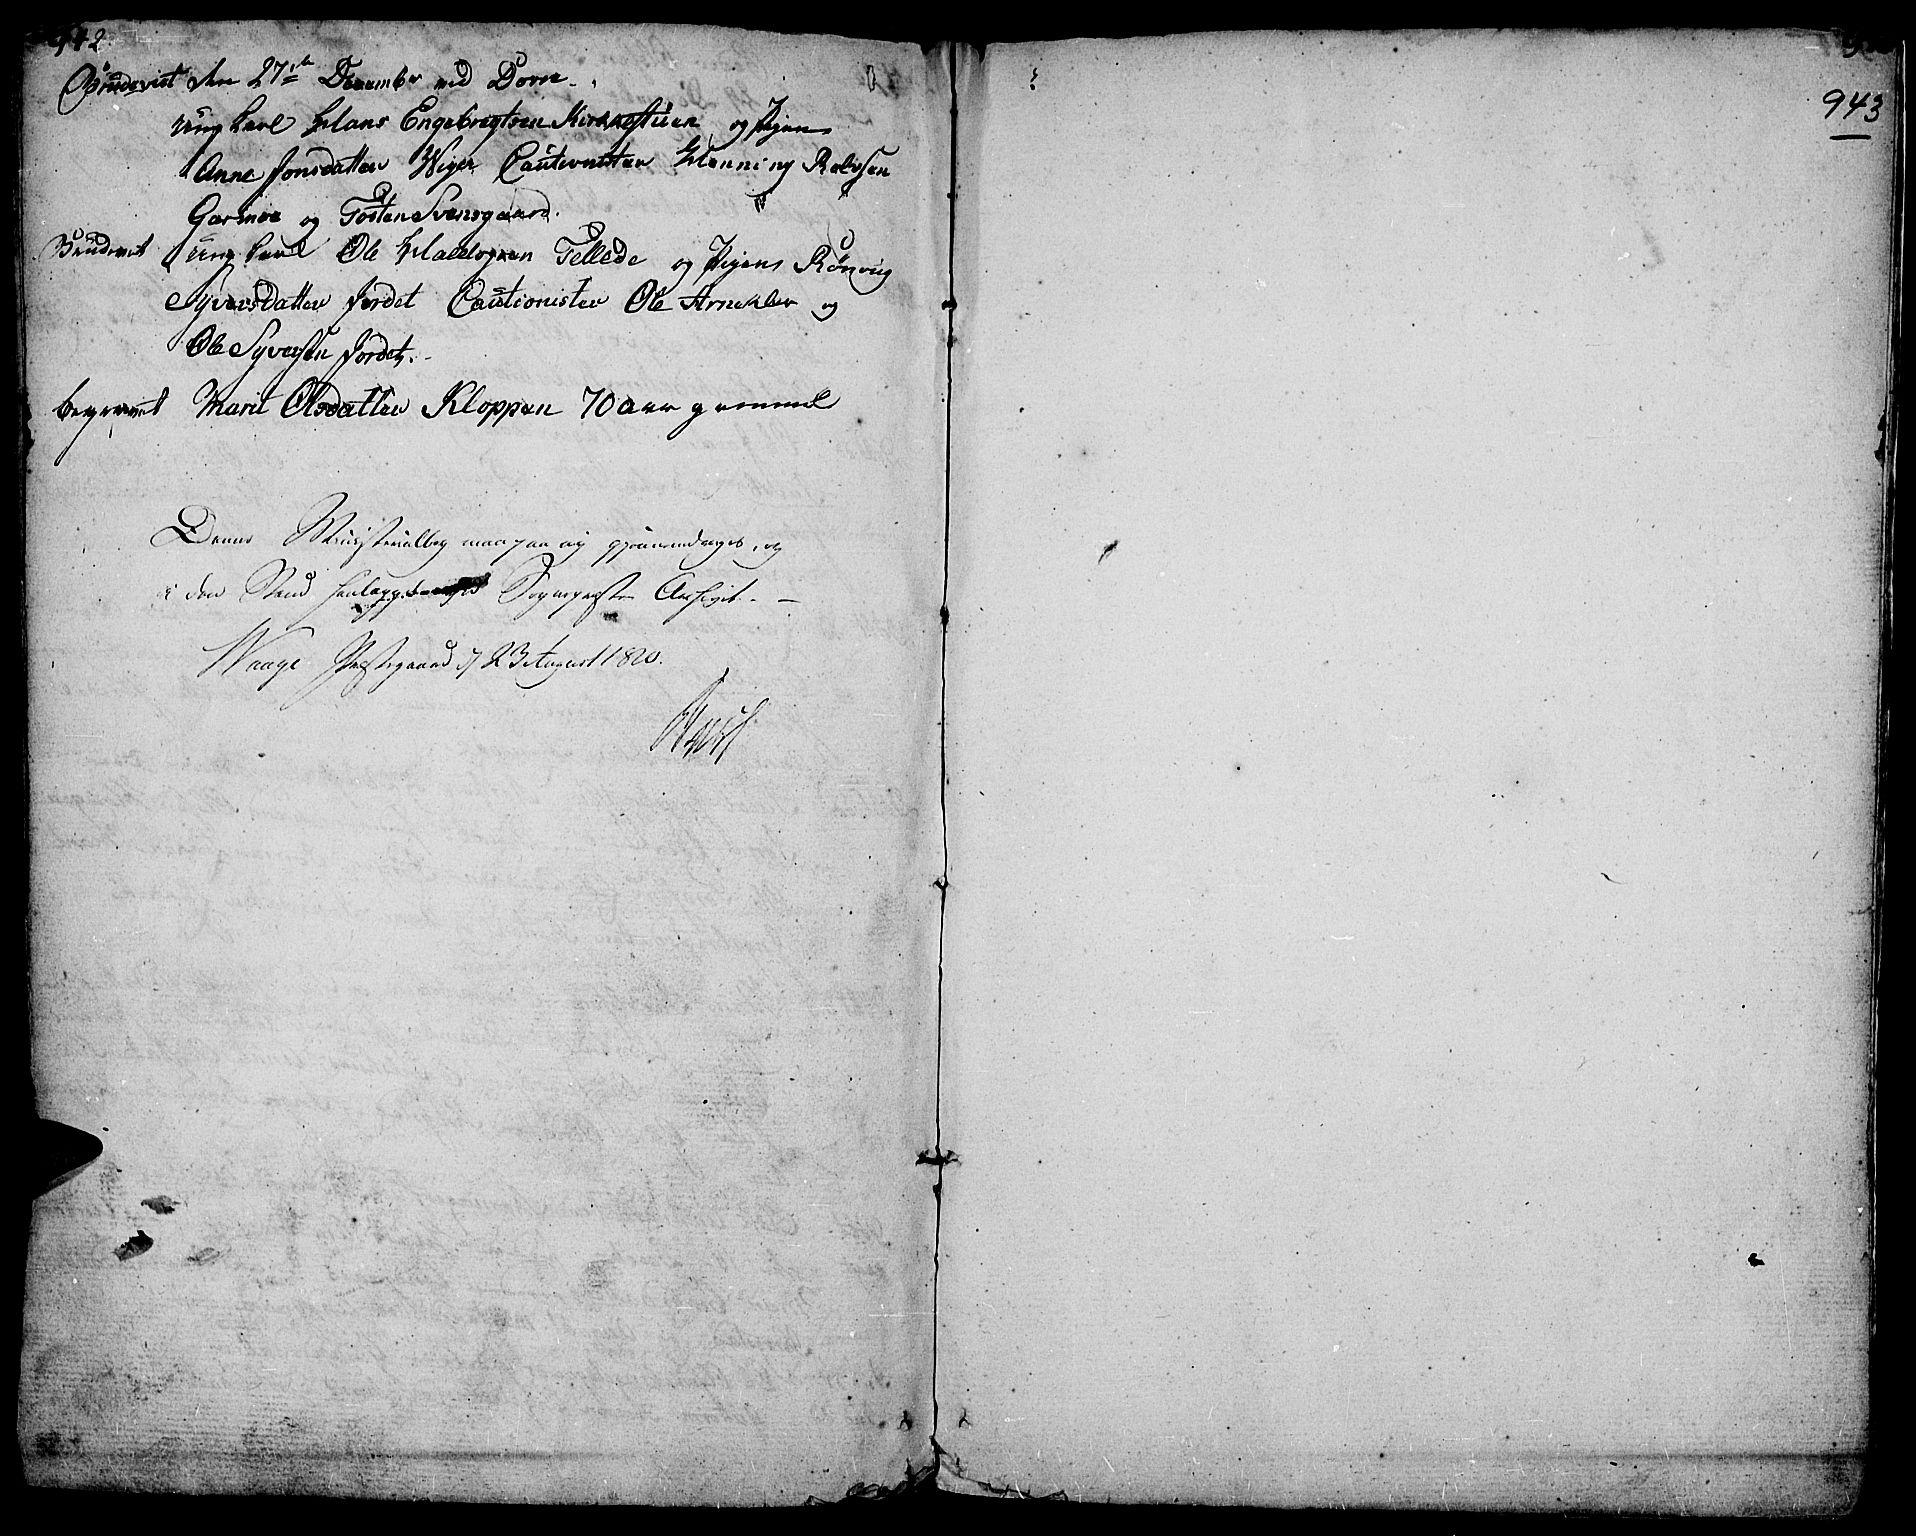 SAH, Lesja prestekontor, Ministerialbok nr. 3, 1777-1819, s. 942-943